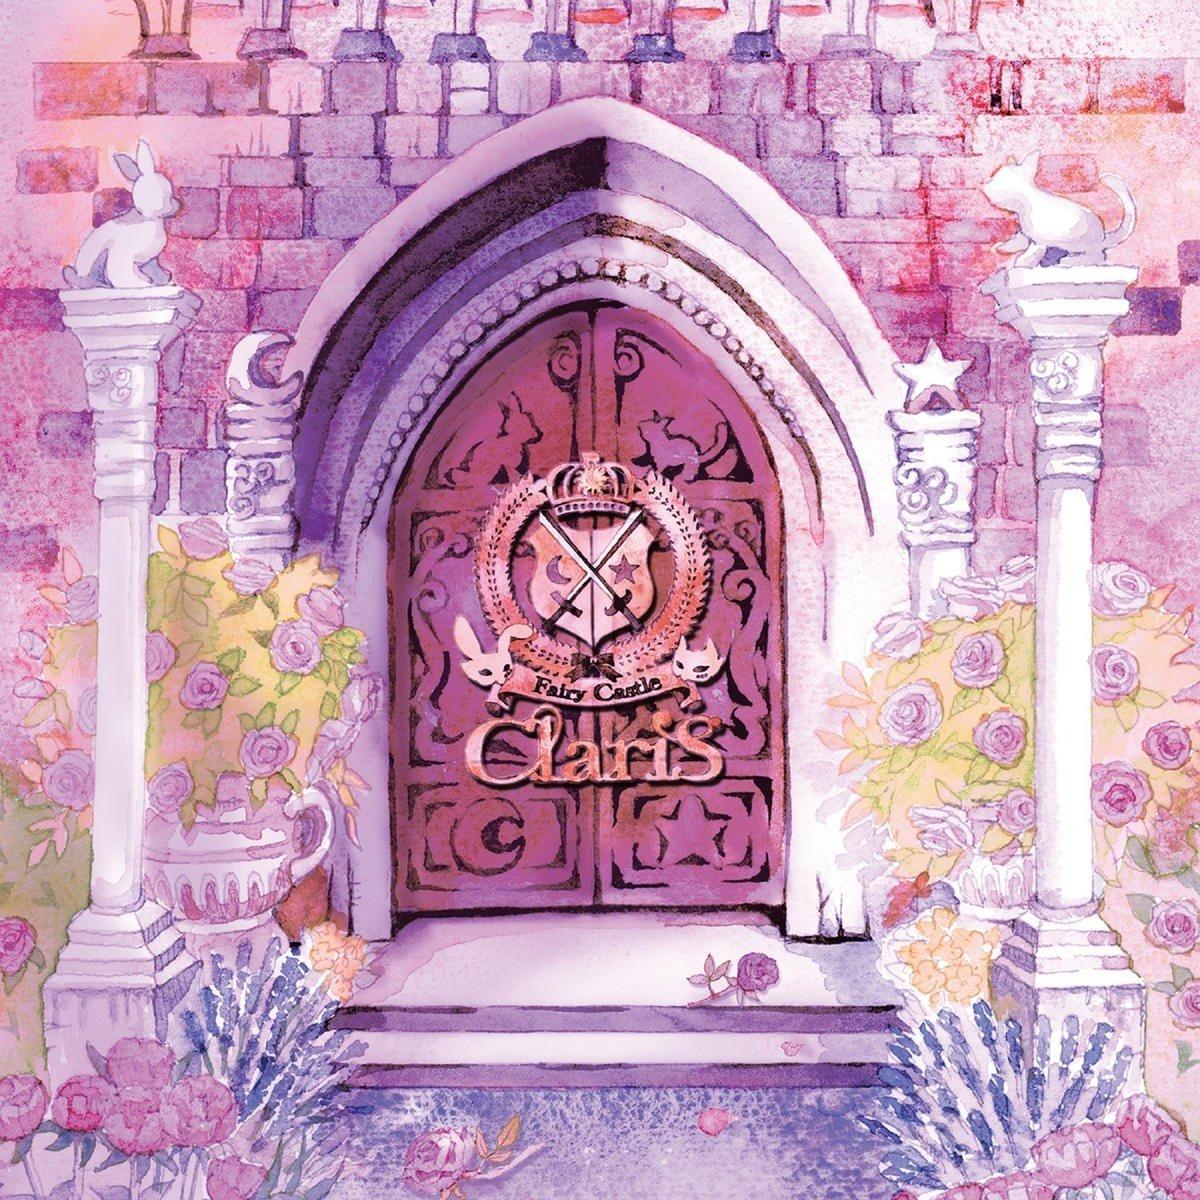 [Album] ClariS – Fairy Castle [FLAC / 24bit Lossless / WEB] [2017.01.25]